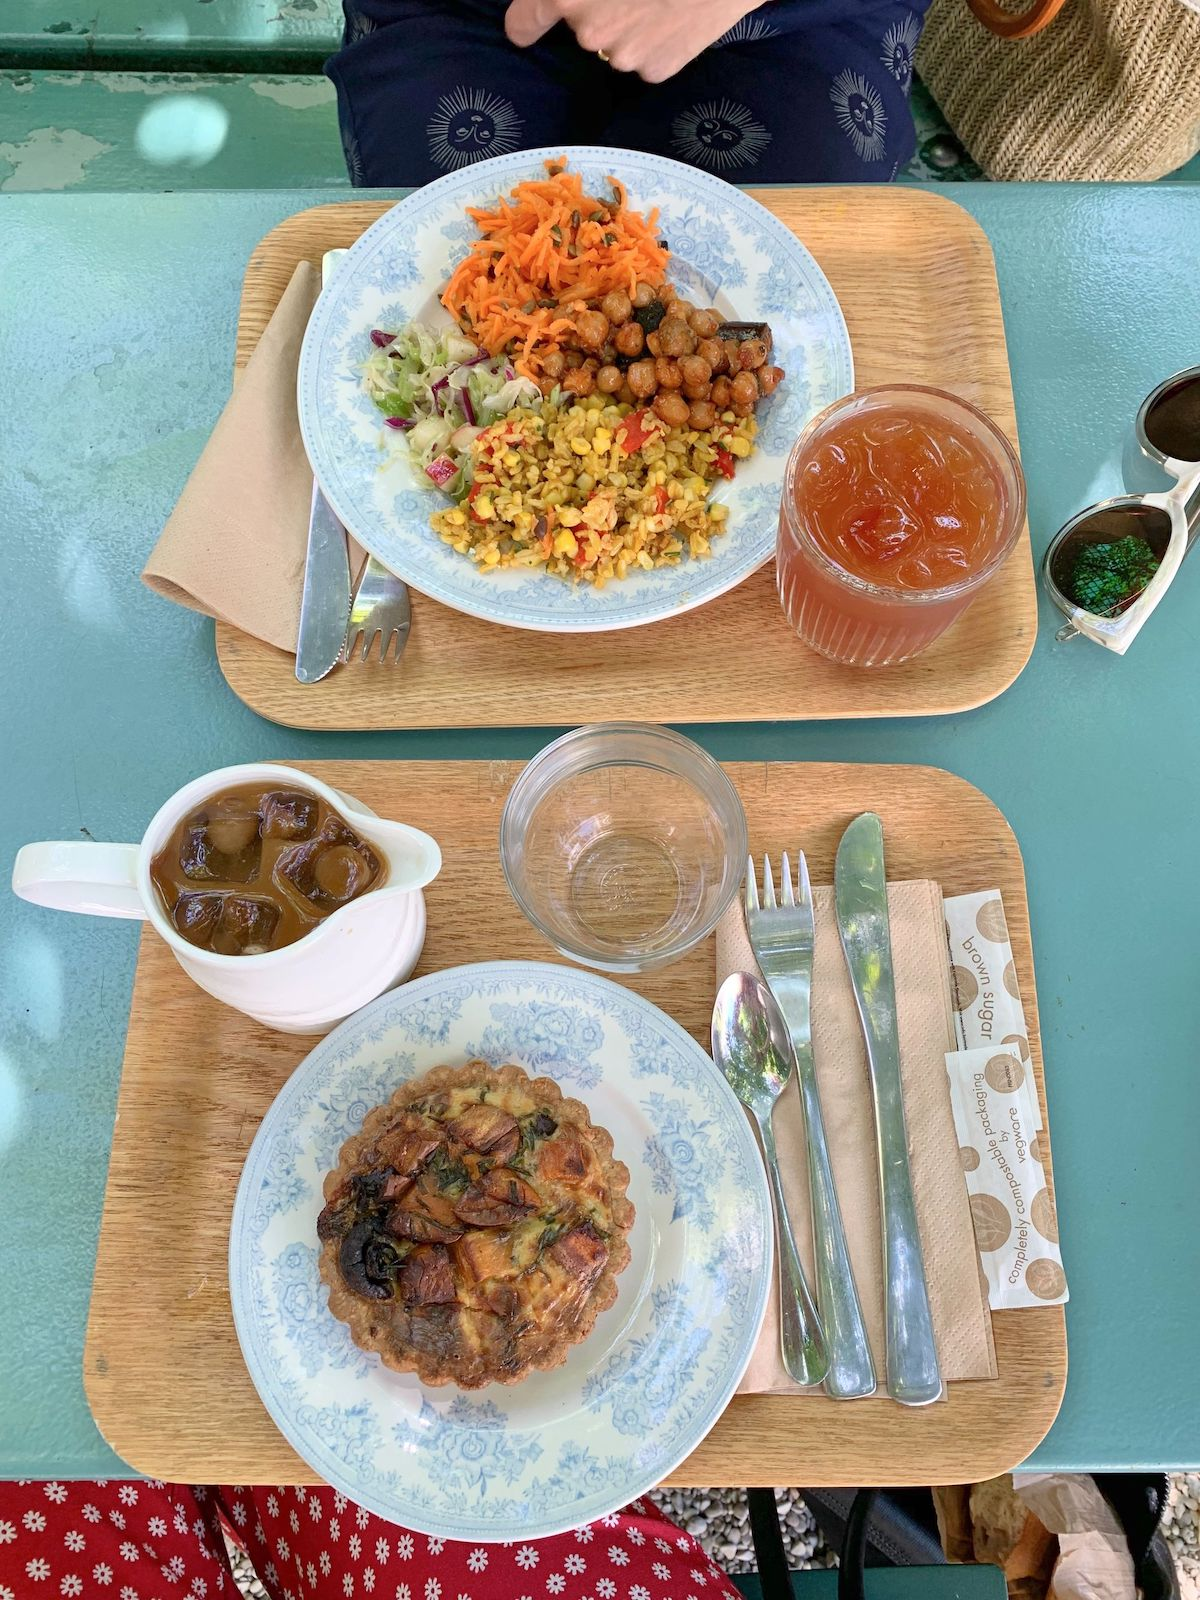 Seasonal Salad and Quiche at Rose Bakery in the hidden garden courtyard of the Musée de la Vie Romantique